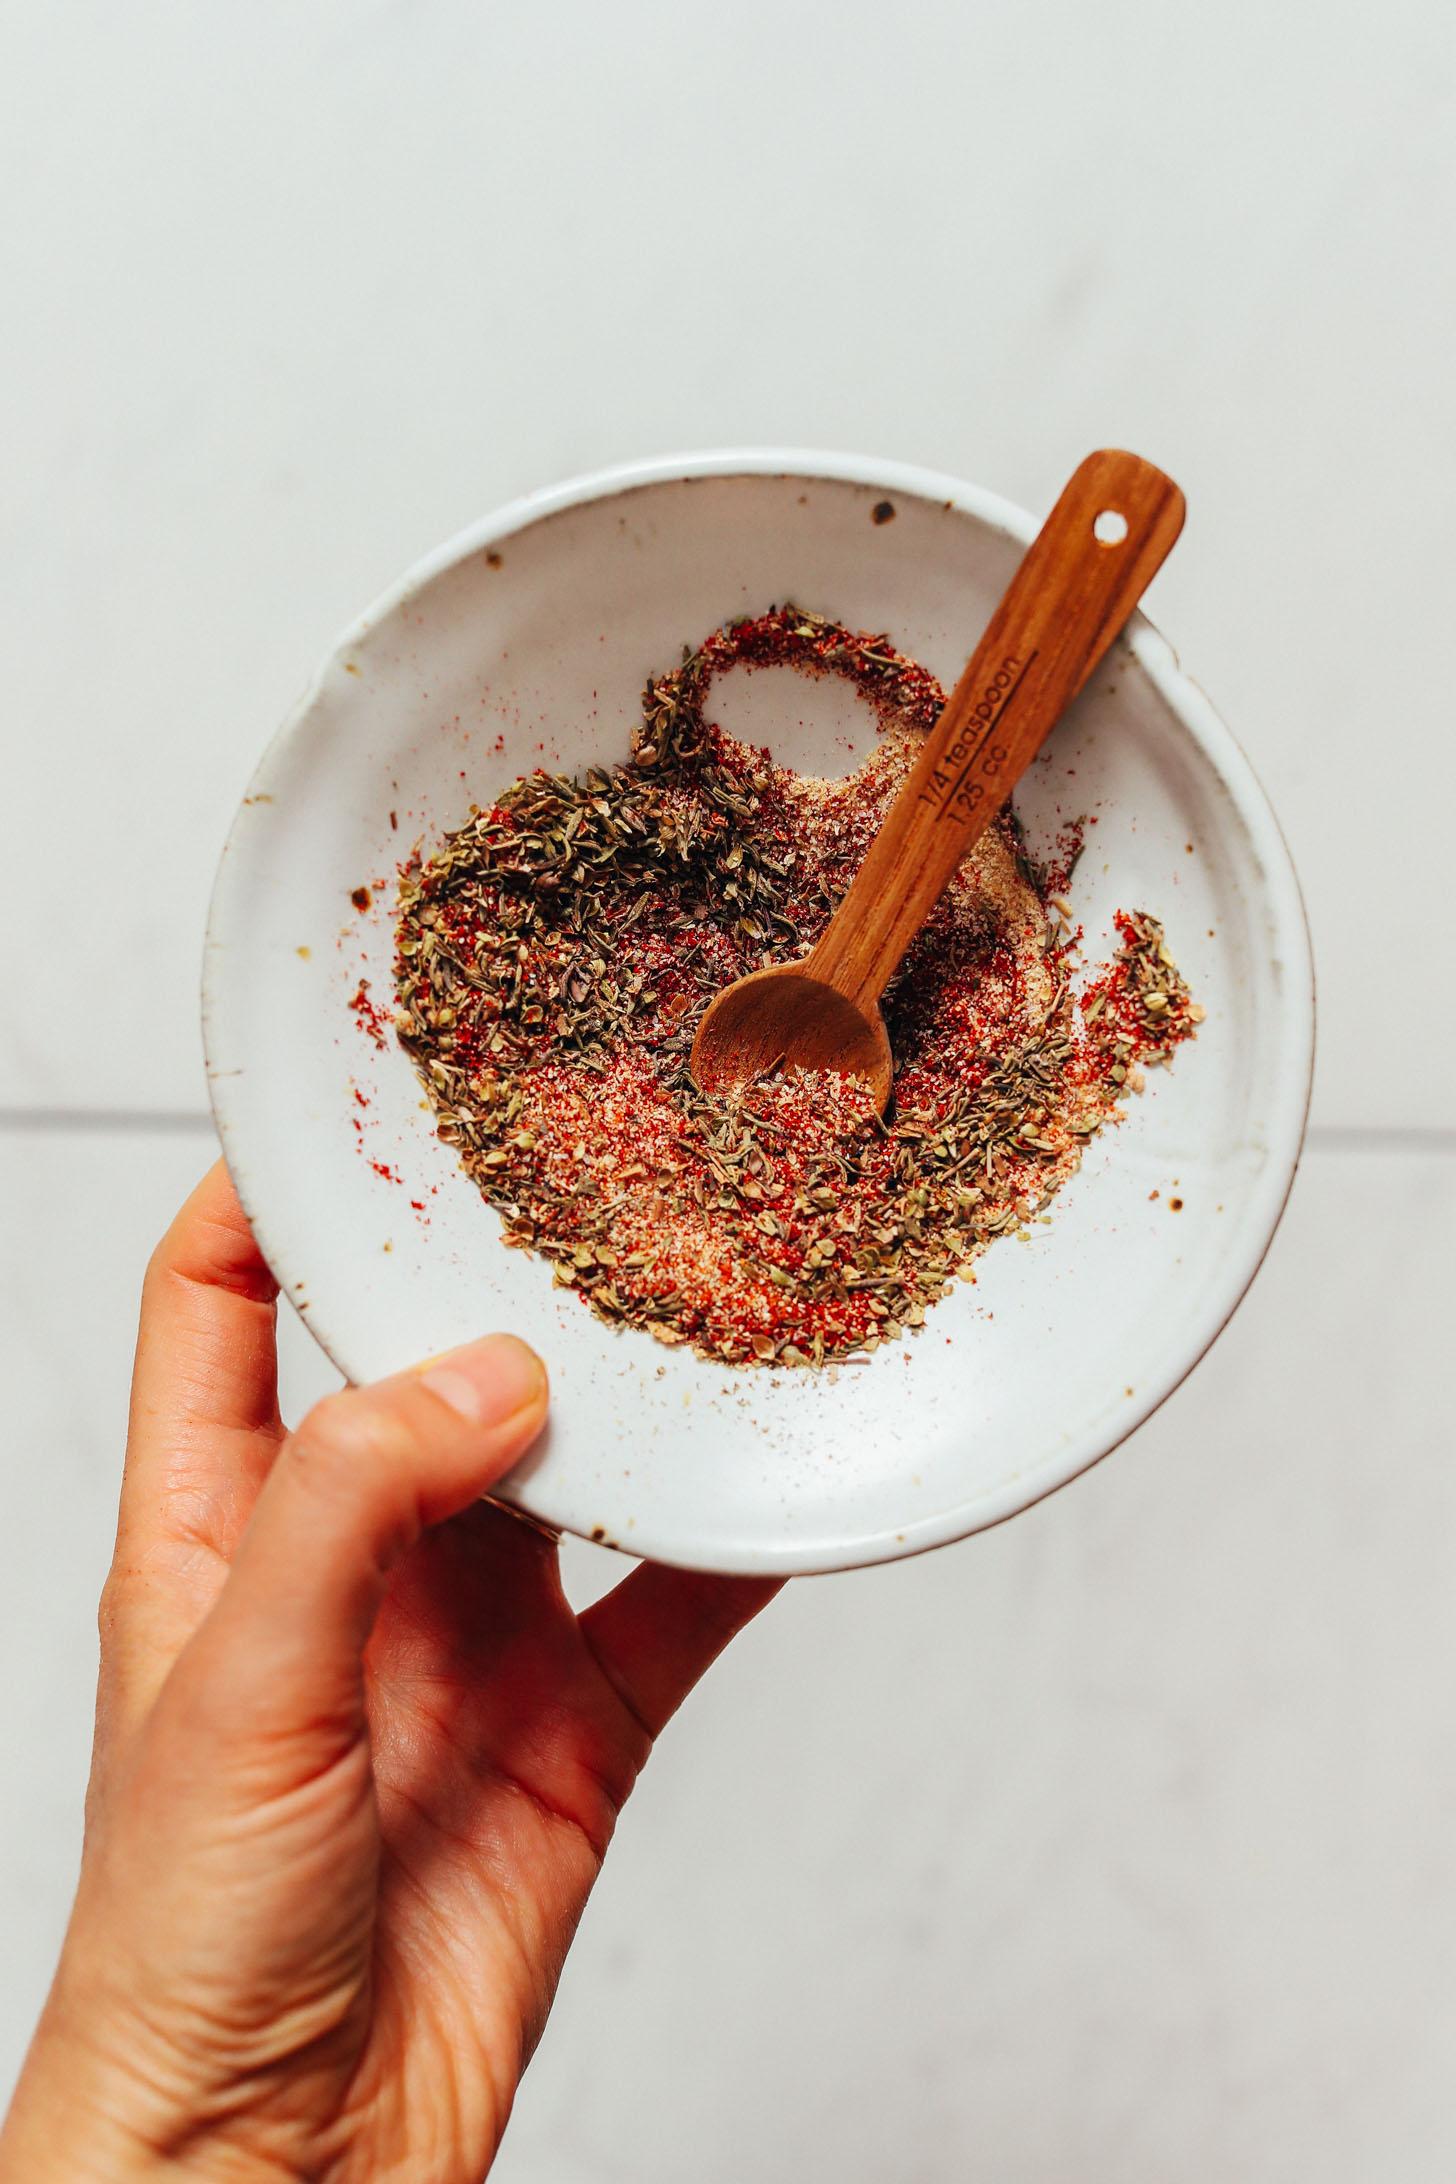 Bowl of cajun spices